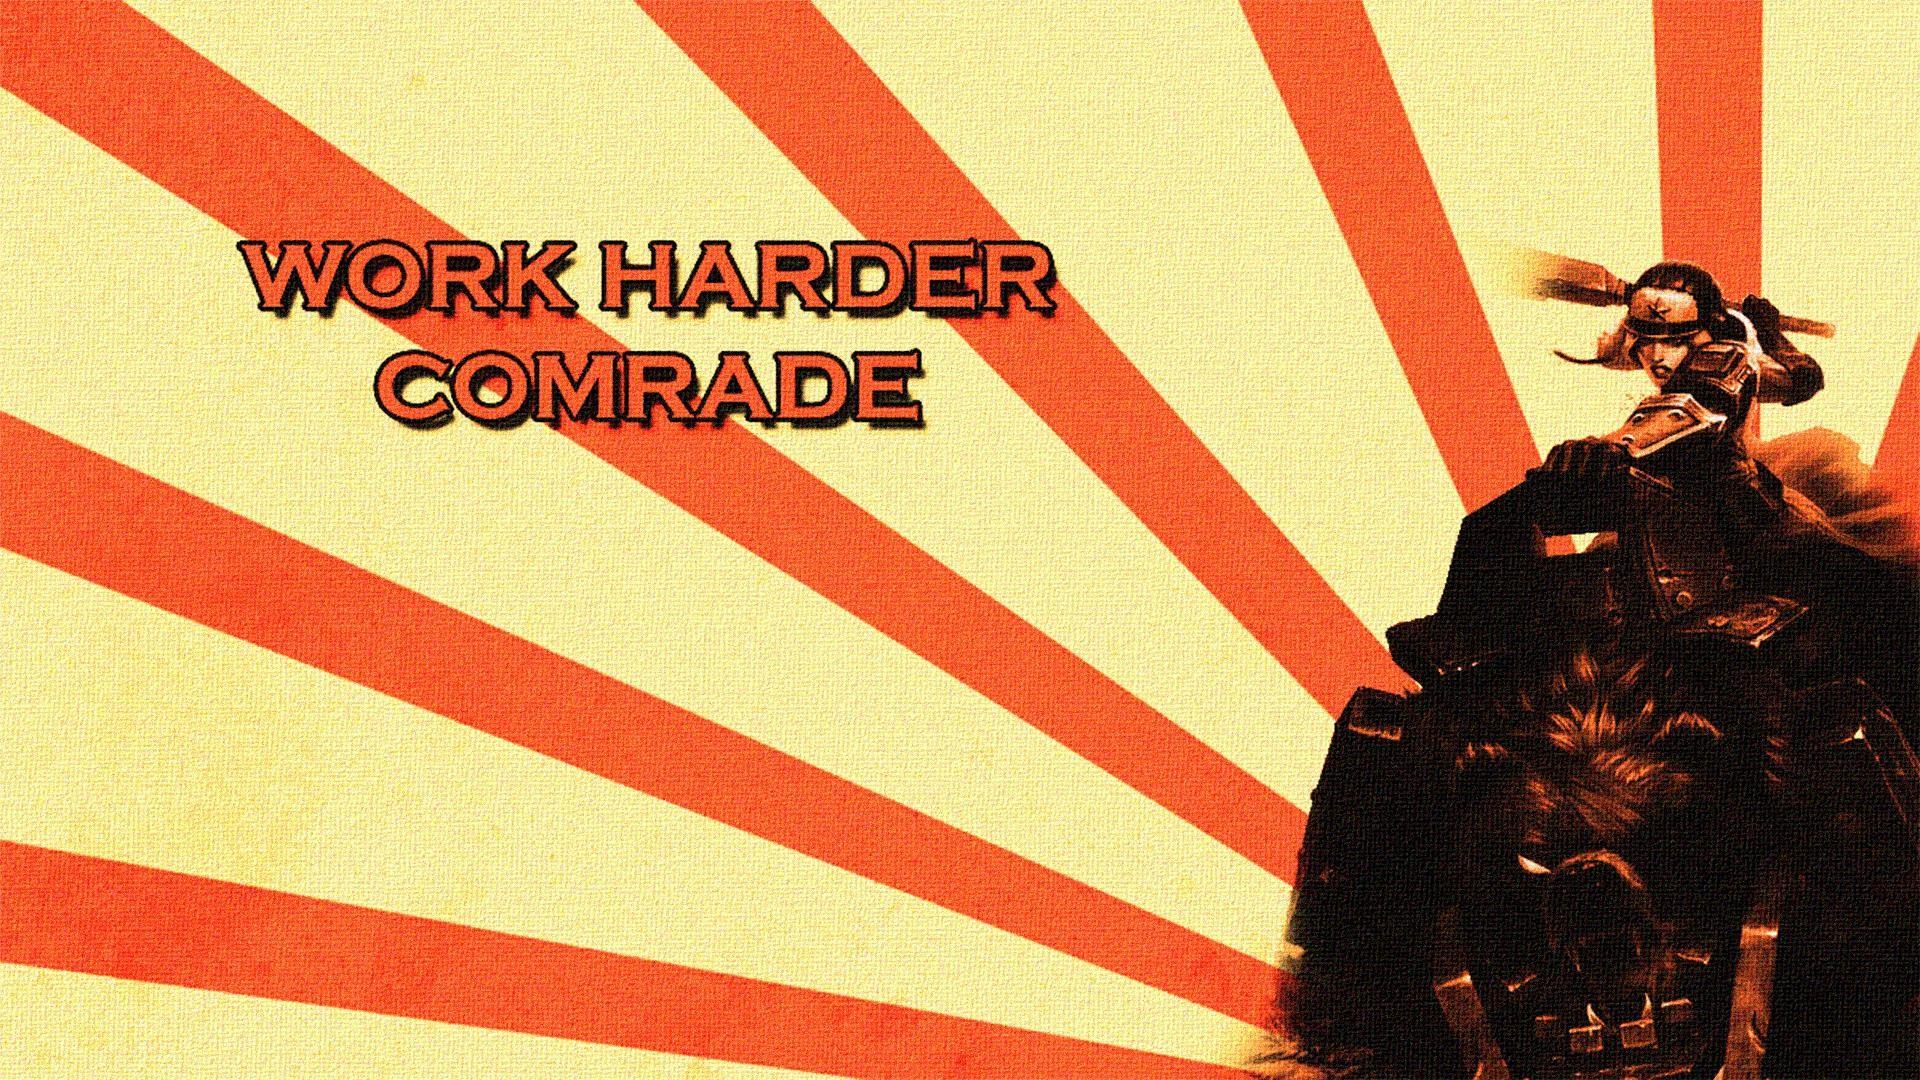 Communist Wallpaper 67 Images